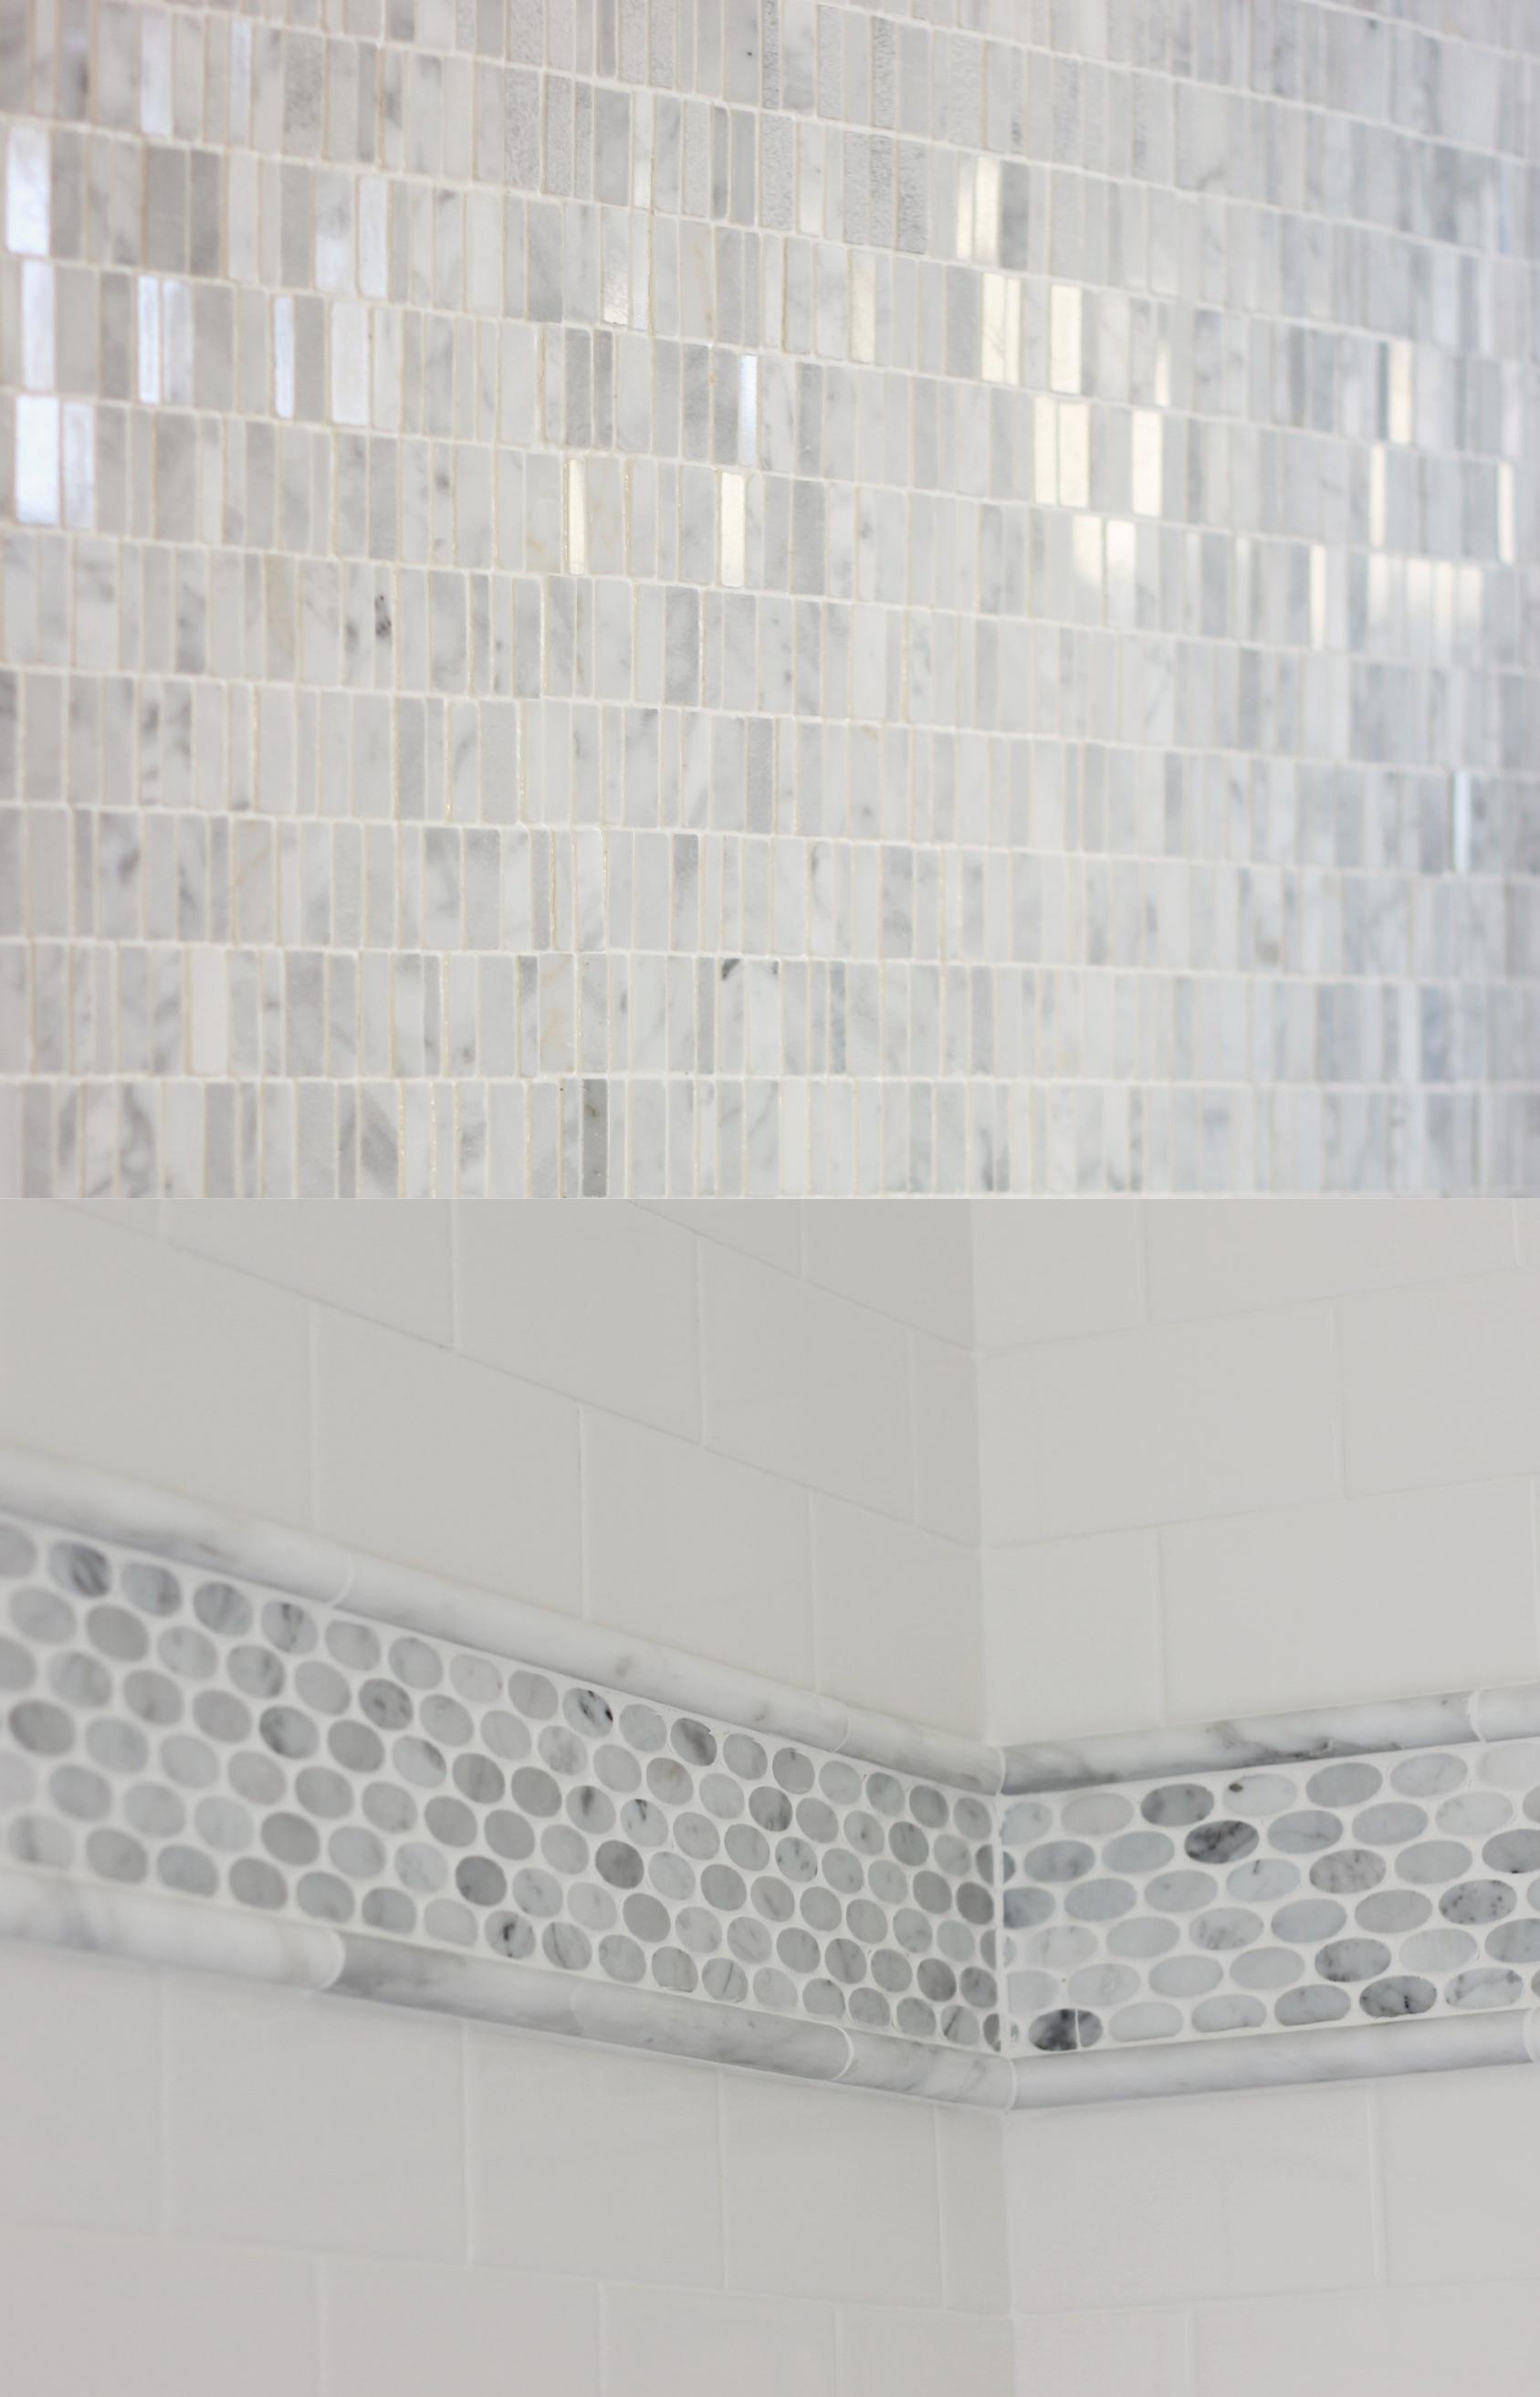 Daltile ceramic subway tile